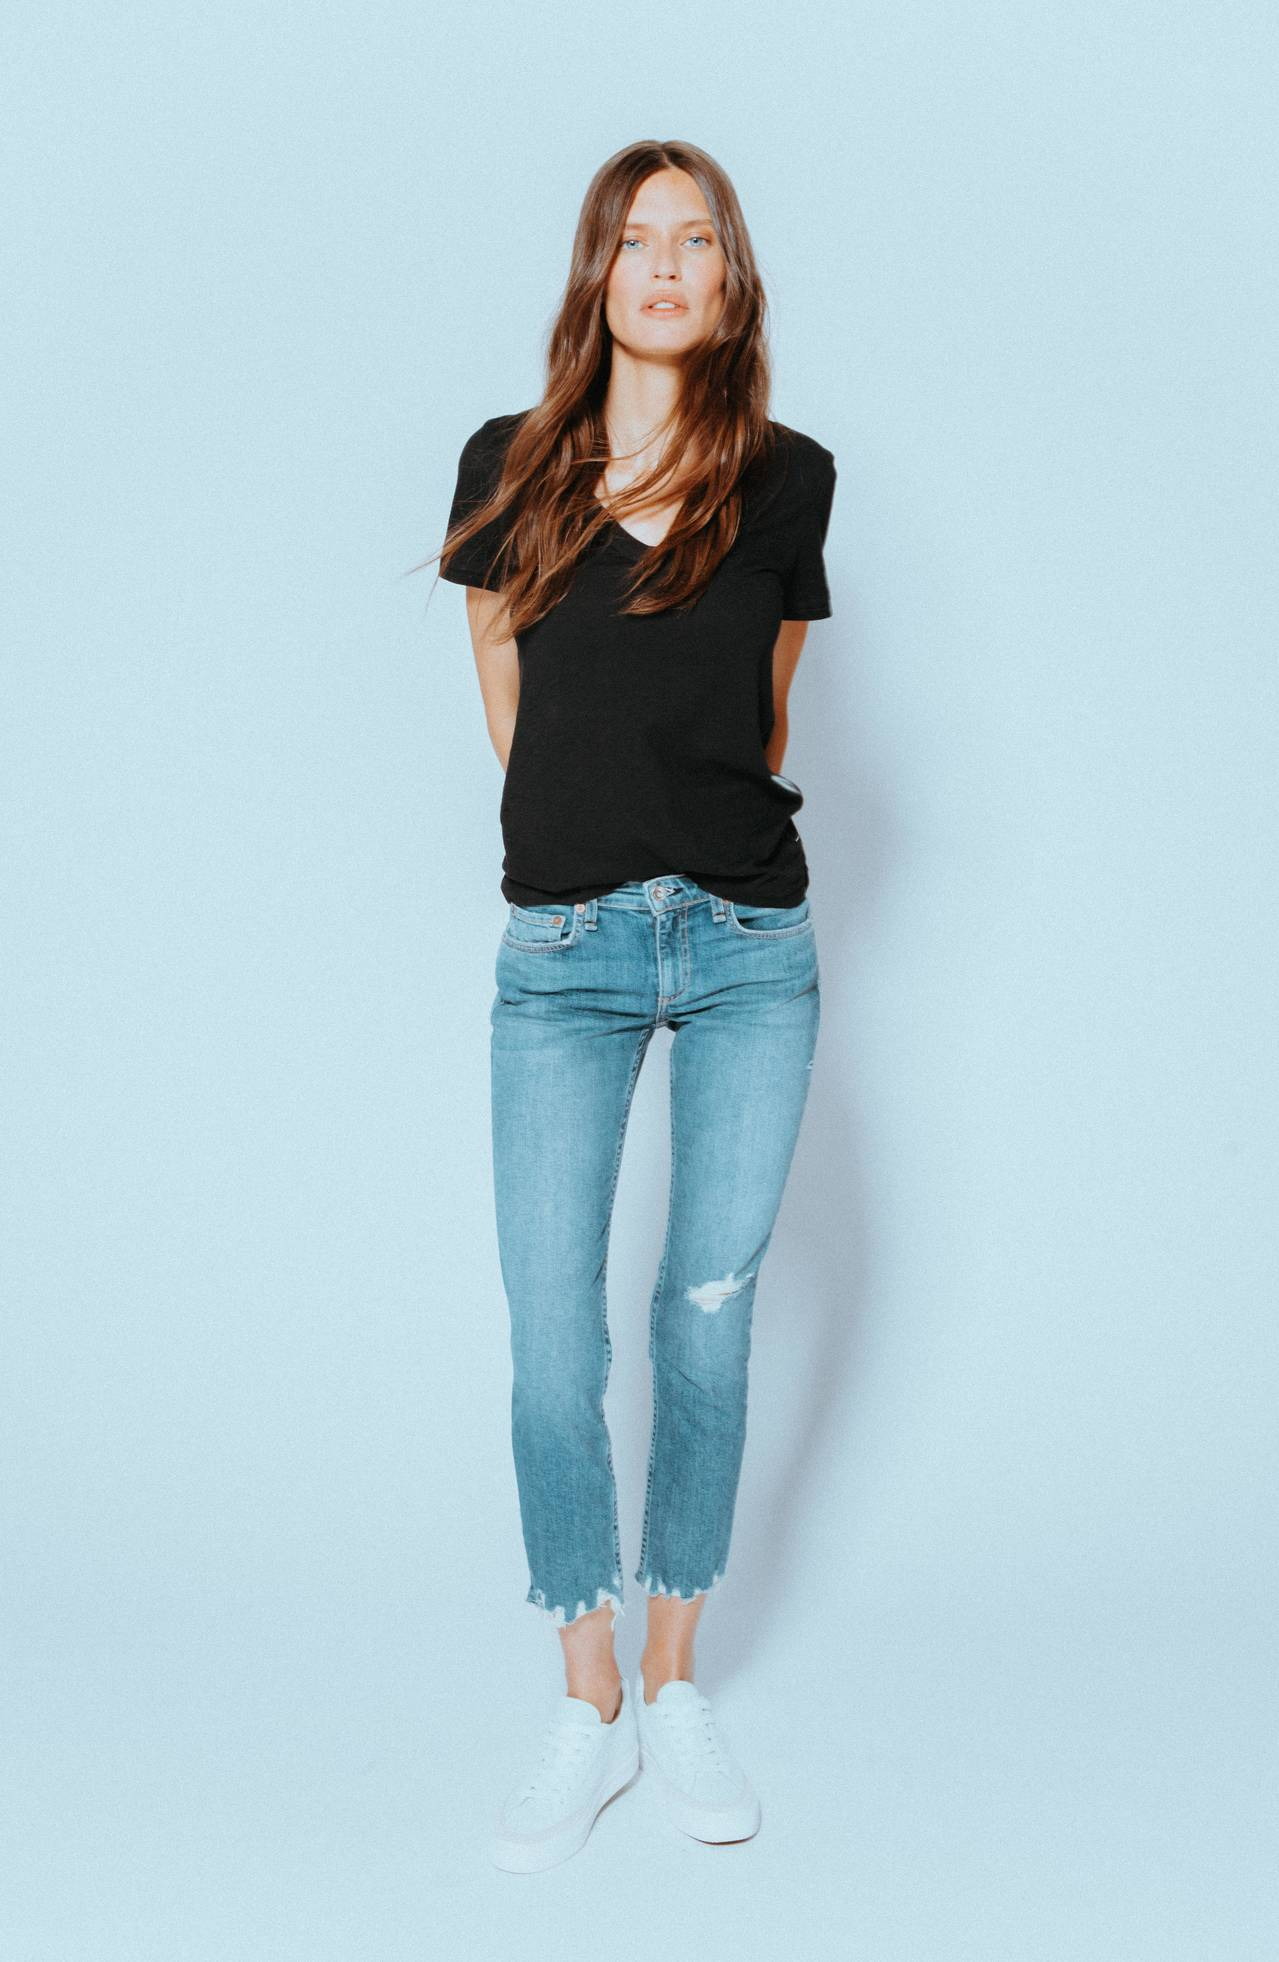 Bianca Balti身穿Dre低腰合身款Boyfriend Jeans。圖/...